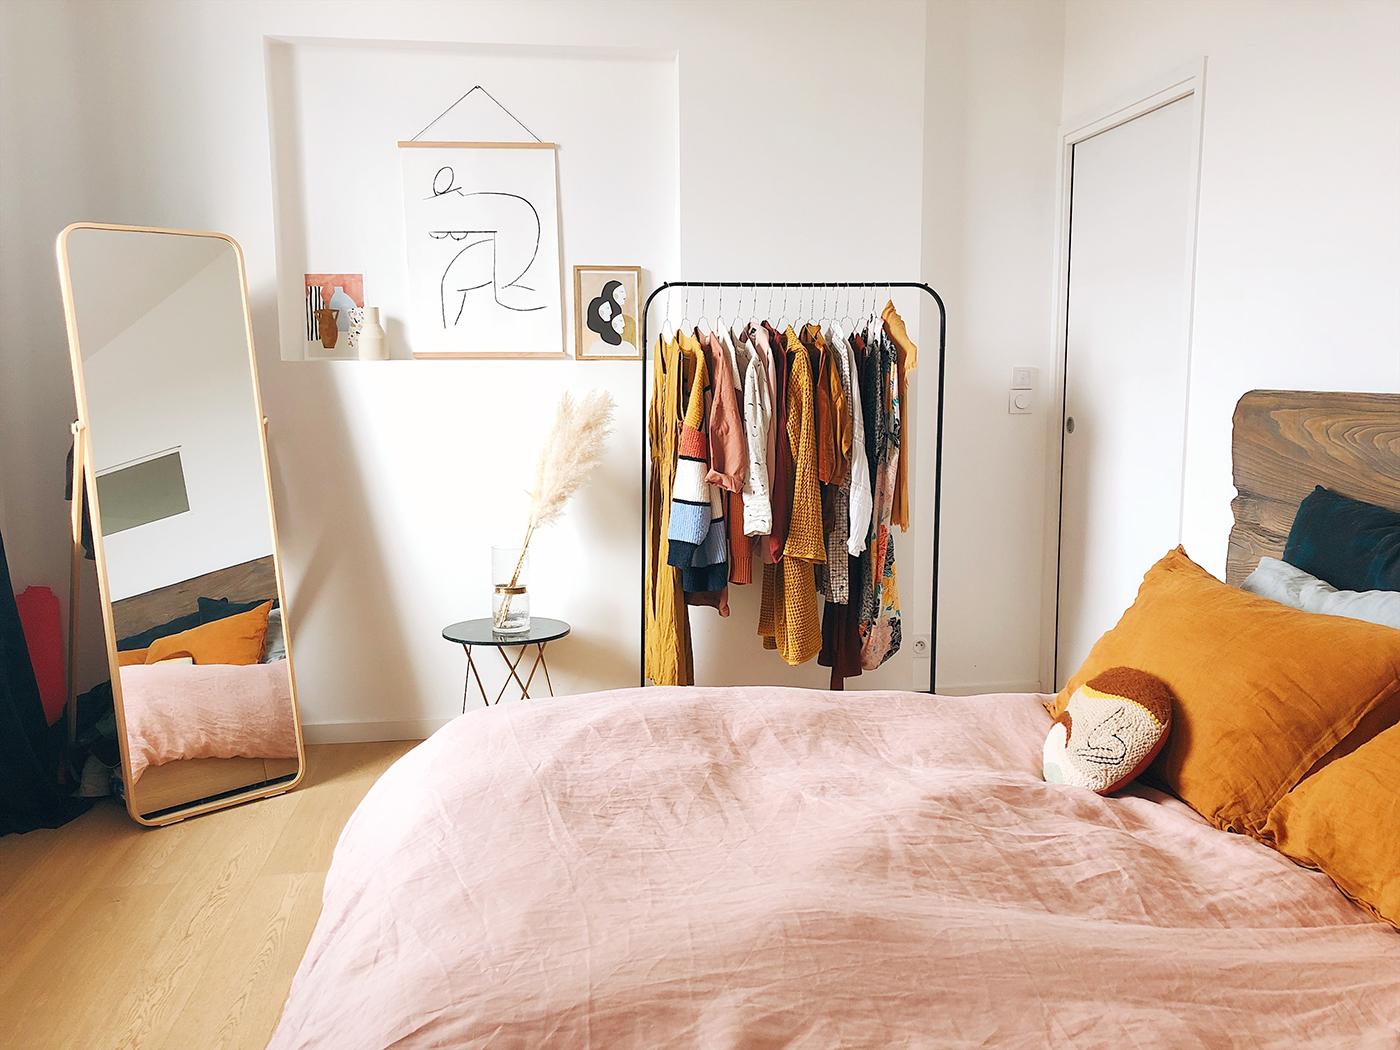 Stylish 1-bedroom apartment interior